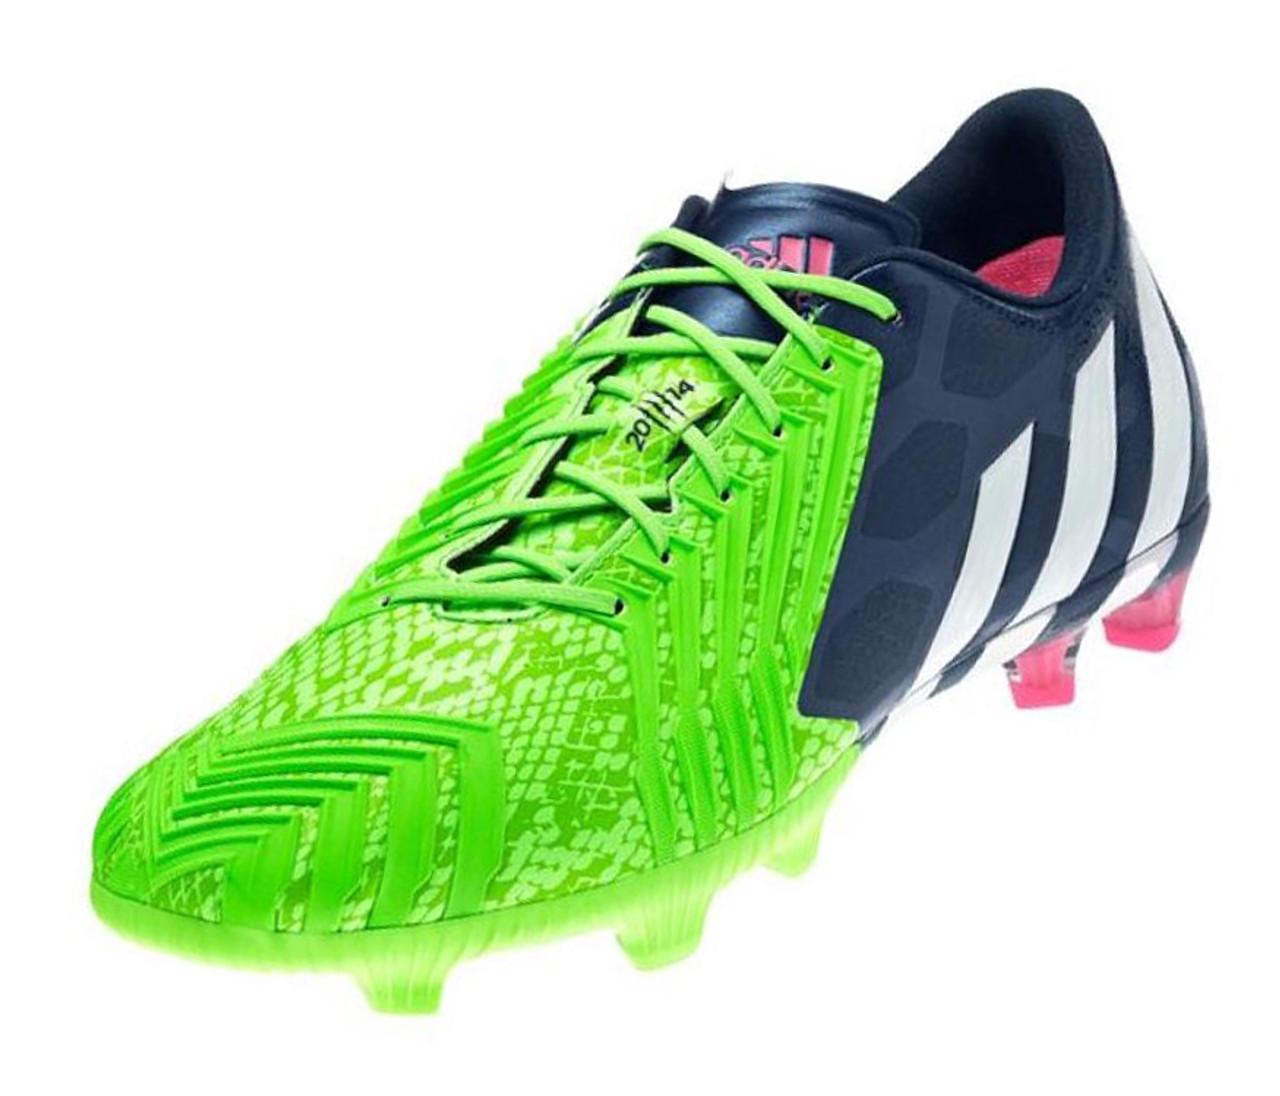 305c34084b6a adidas Predator Instinct FG - Green/Black RC (102018) - ohp soccer